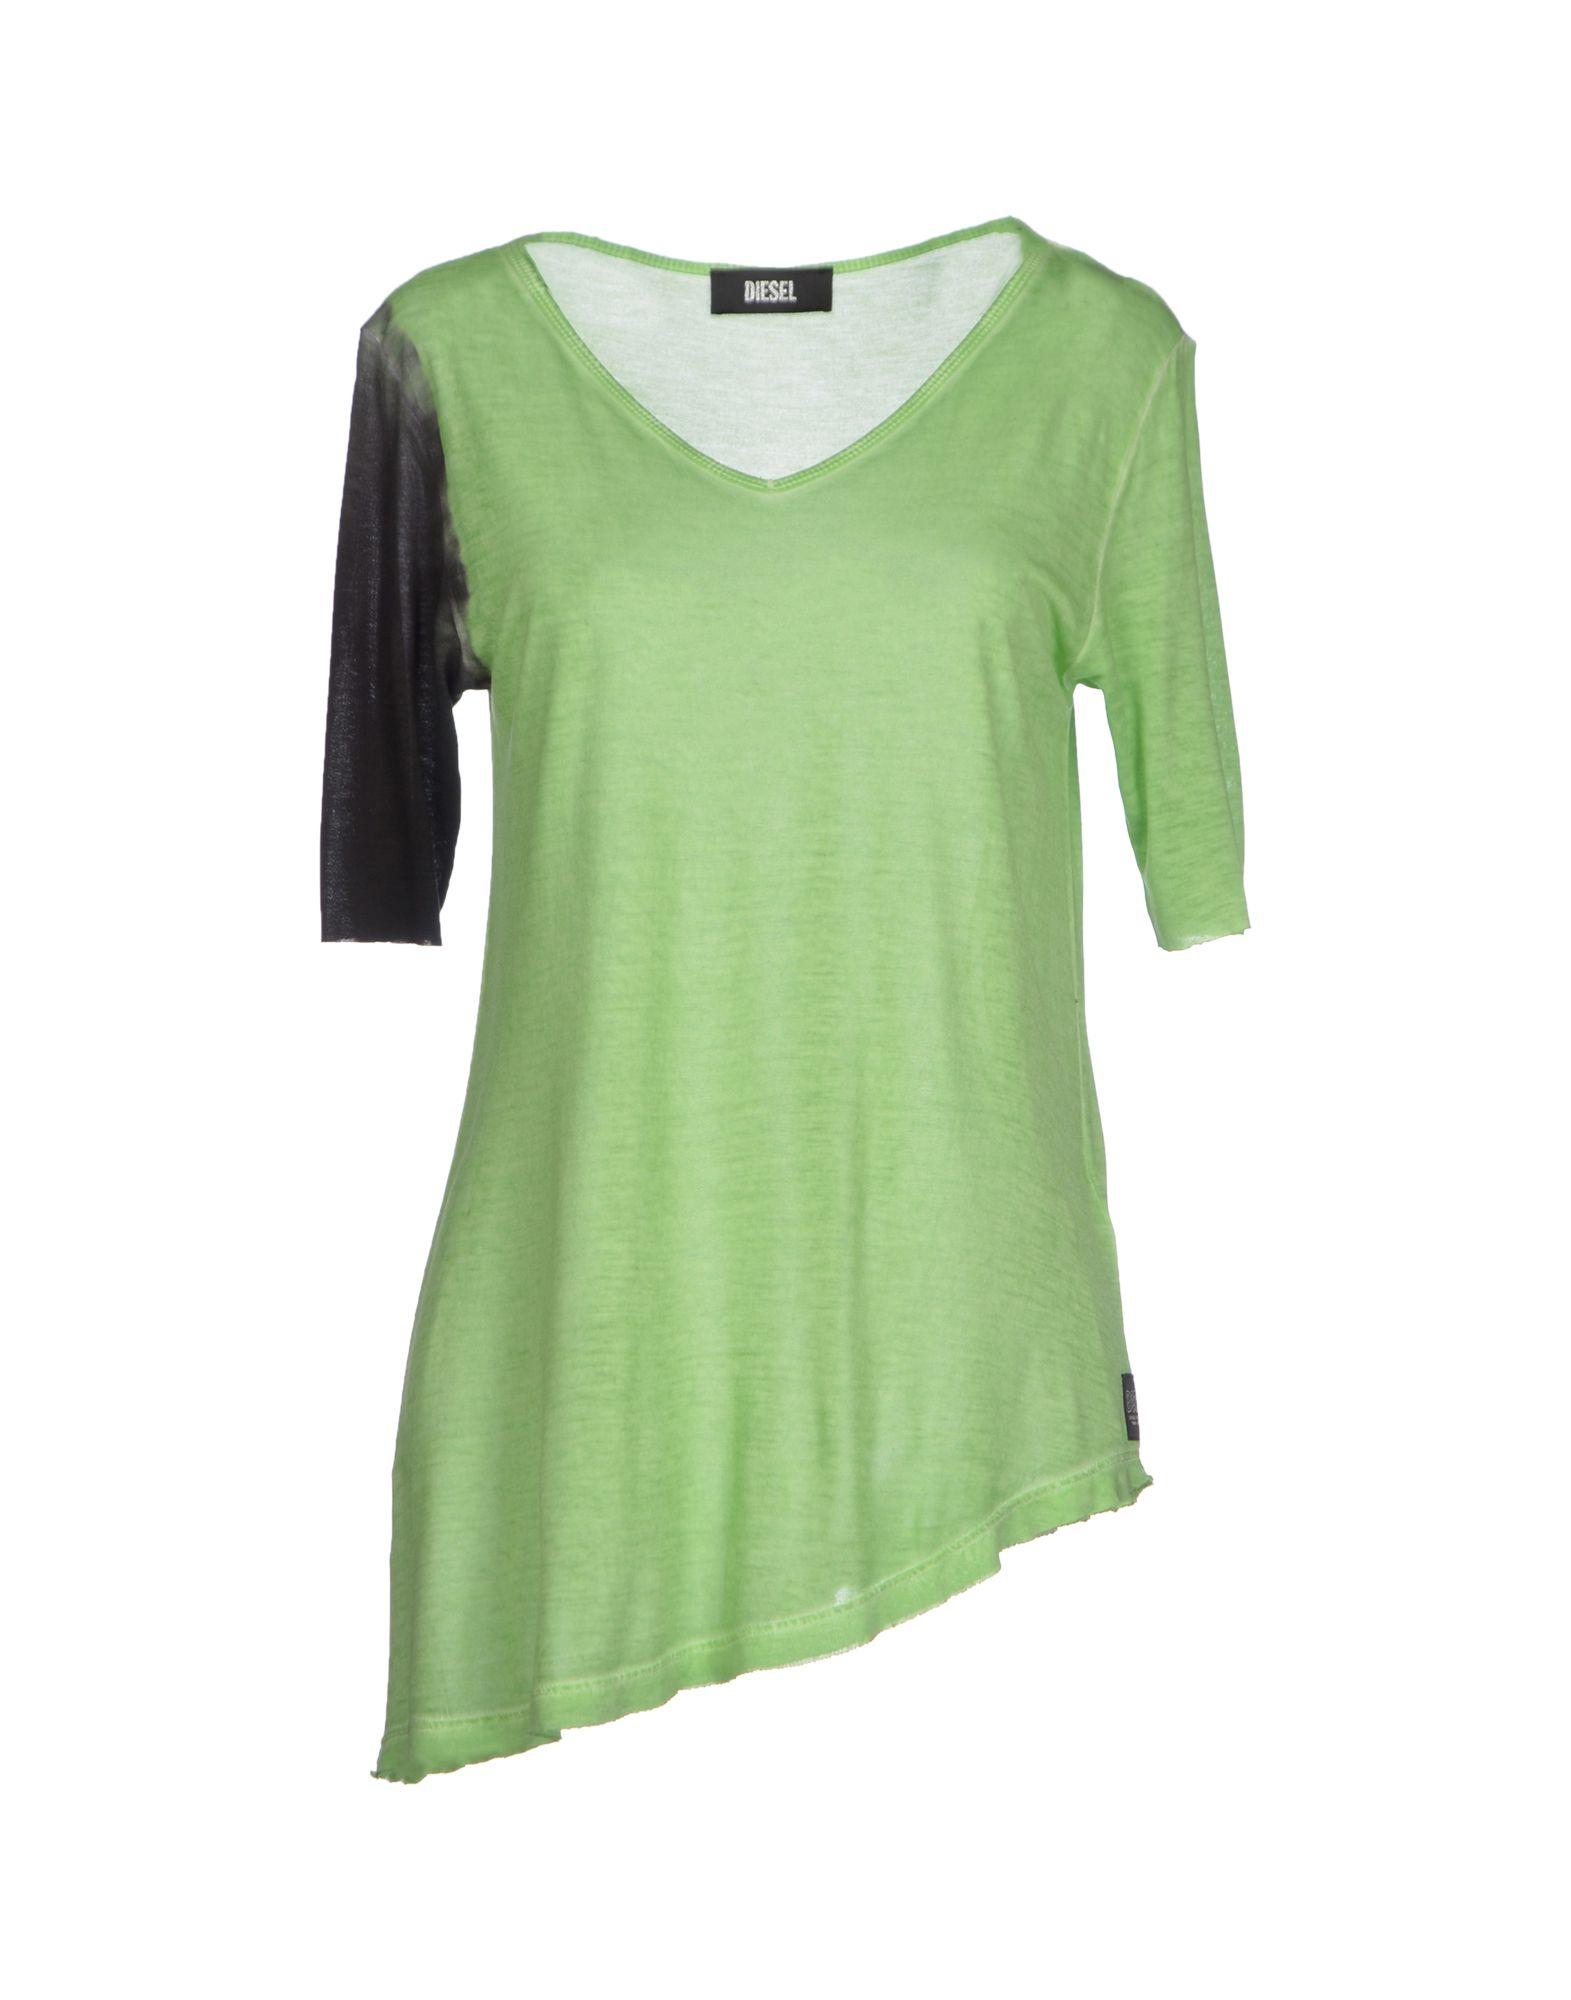 diesel t shirt in green light green lyst. Black Bedroom Furniture Sets. Home Design Ideas